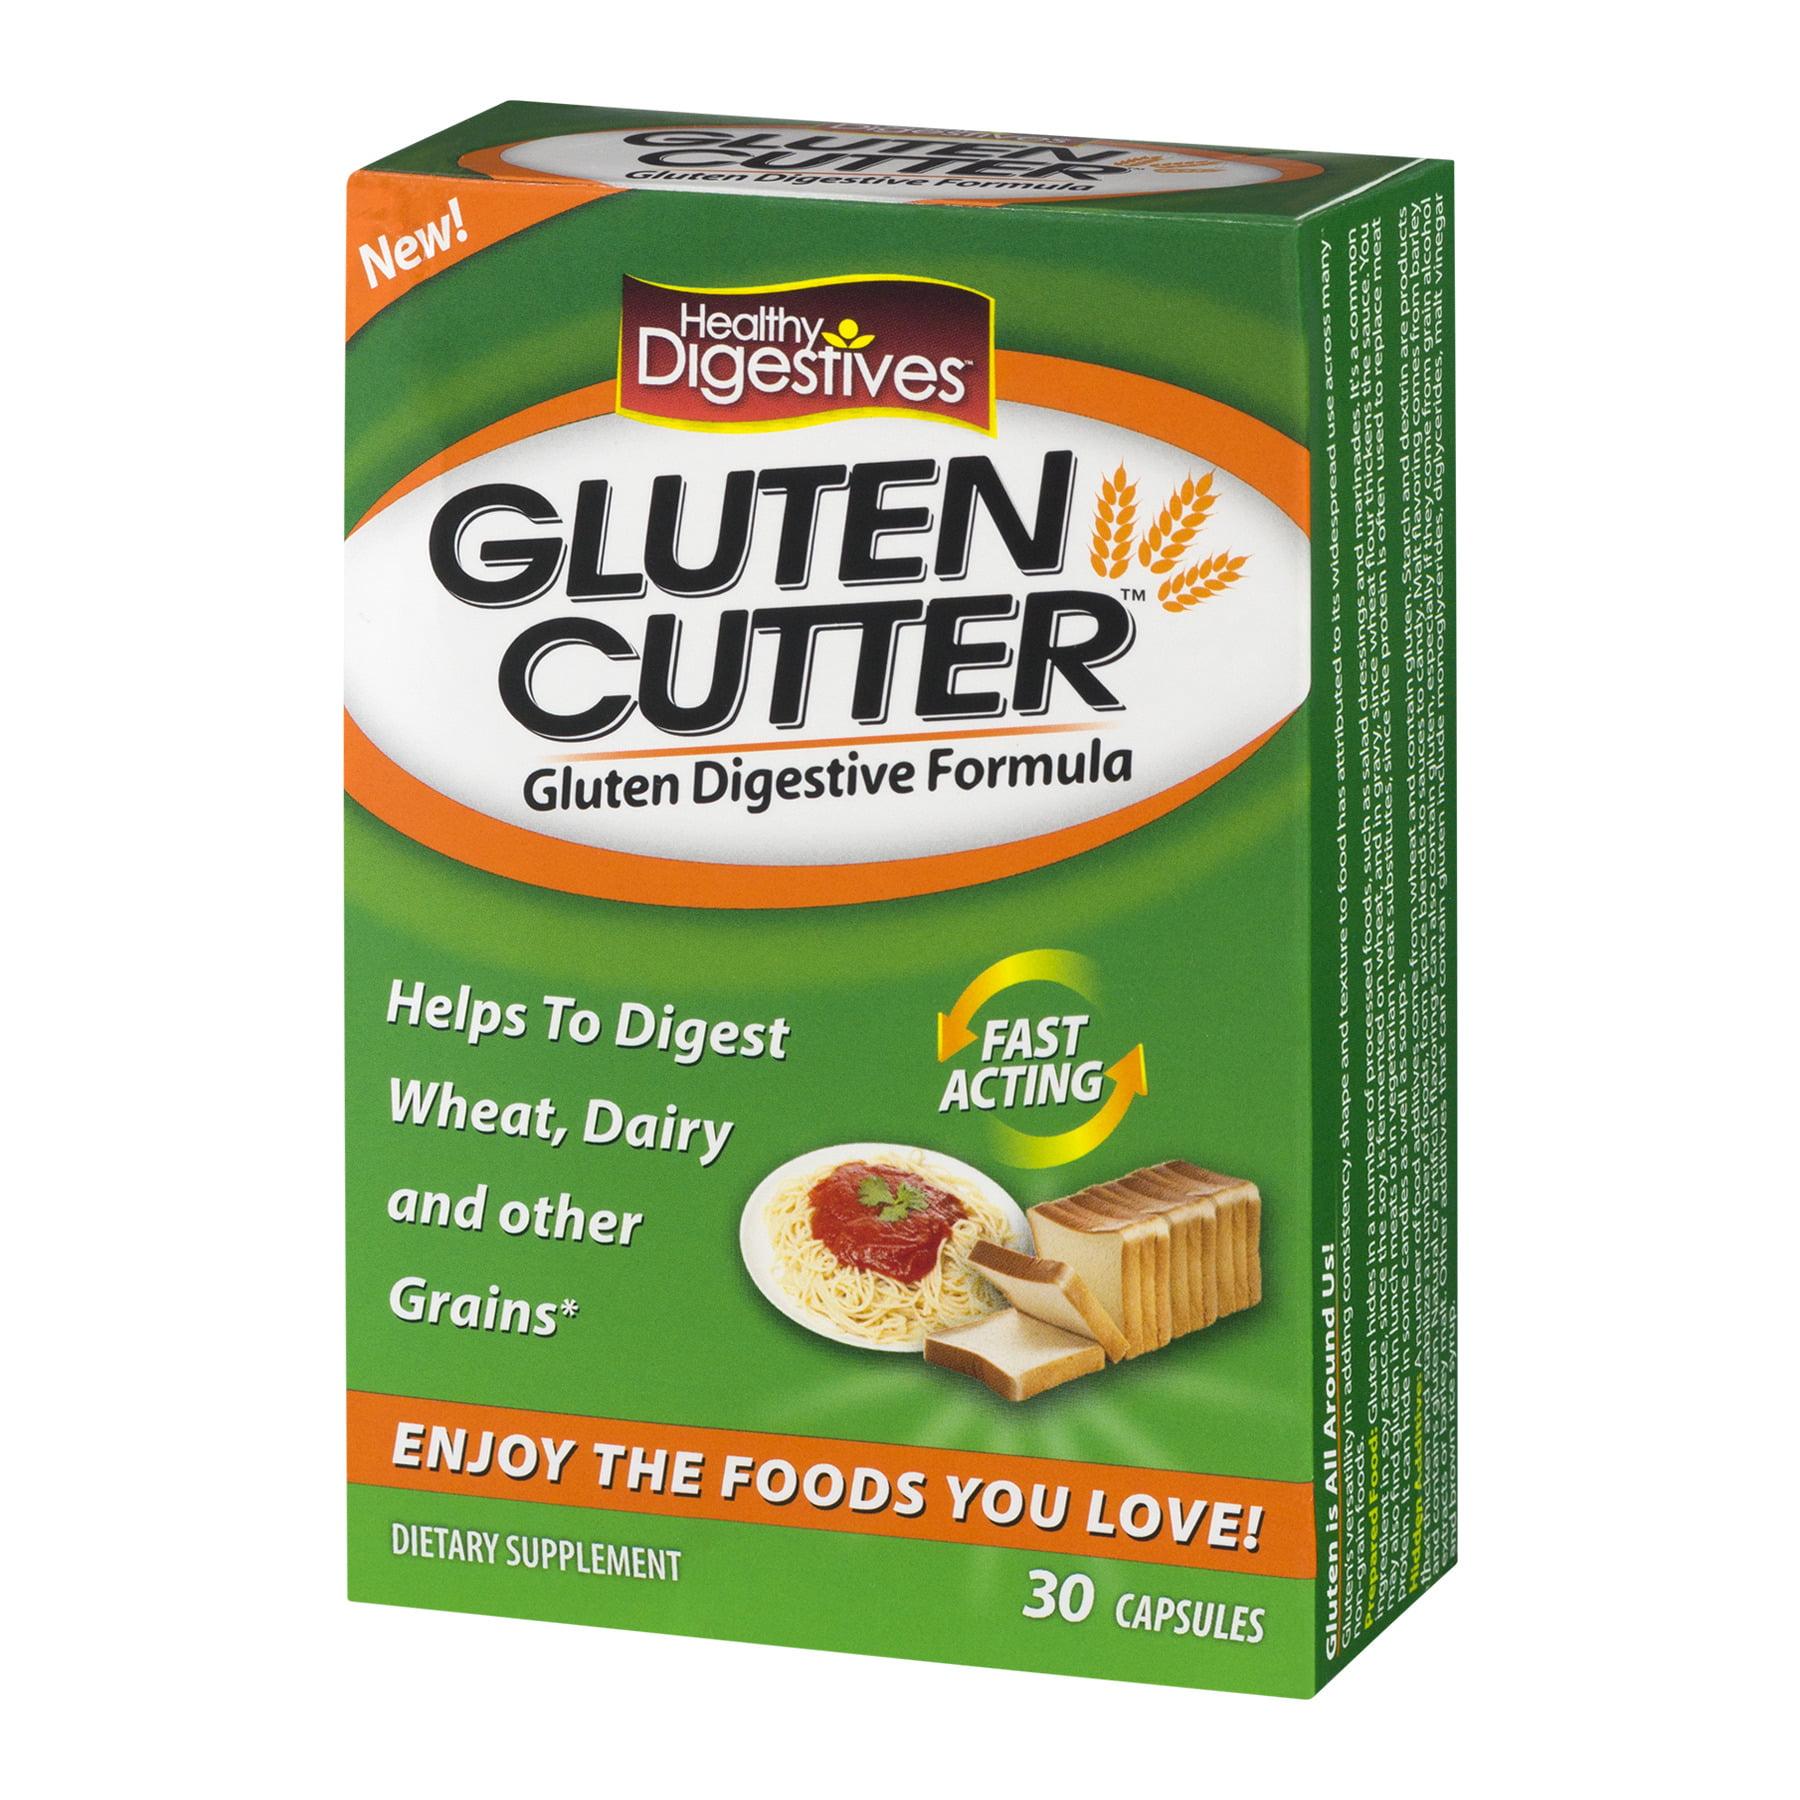 healthy digestives glutten cutter dietary supplement capsules 30